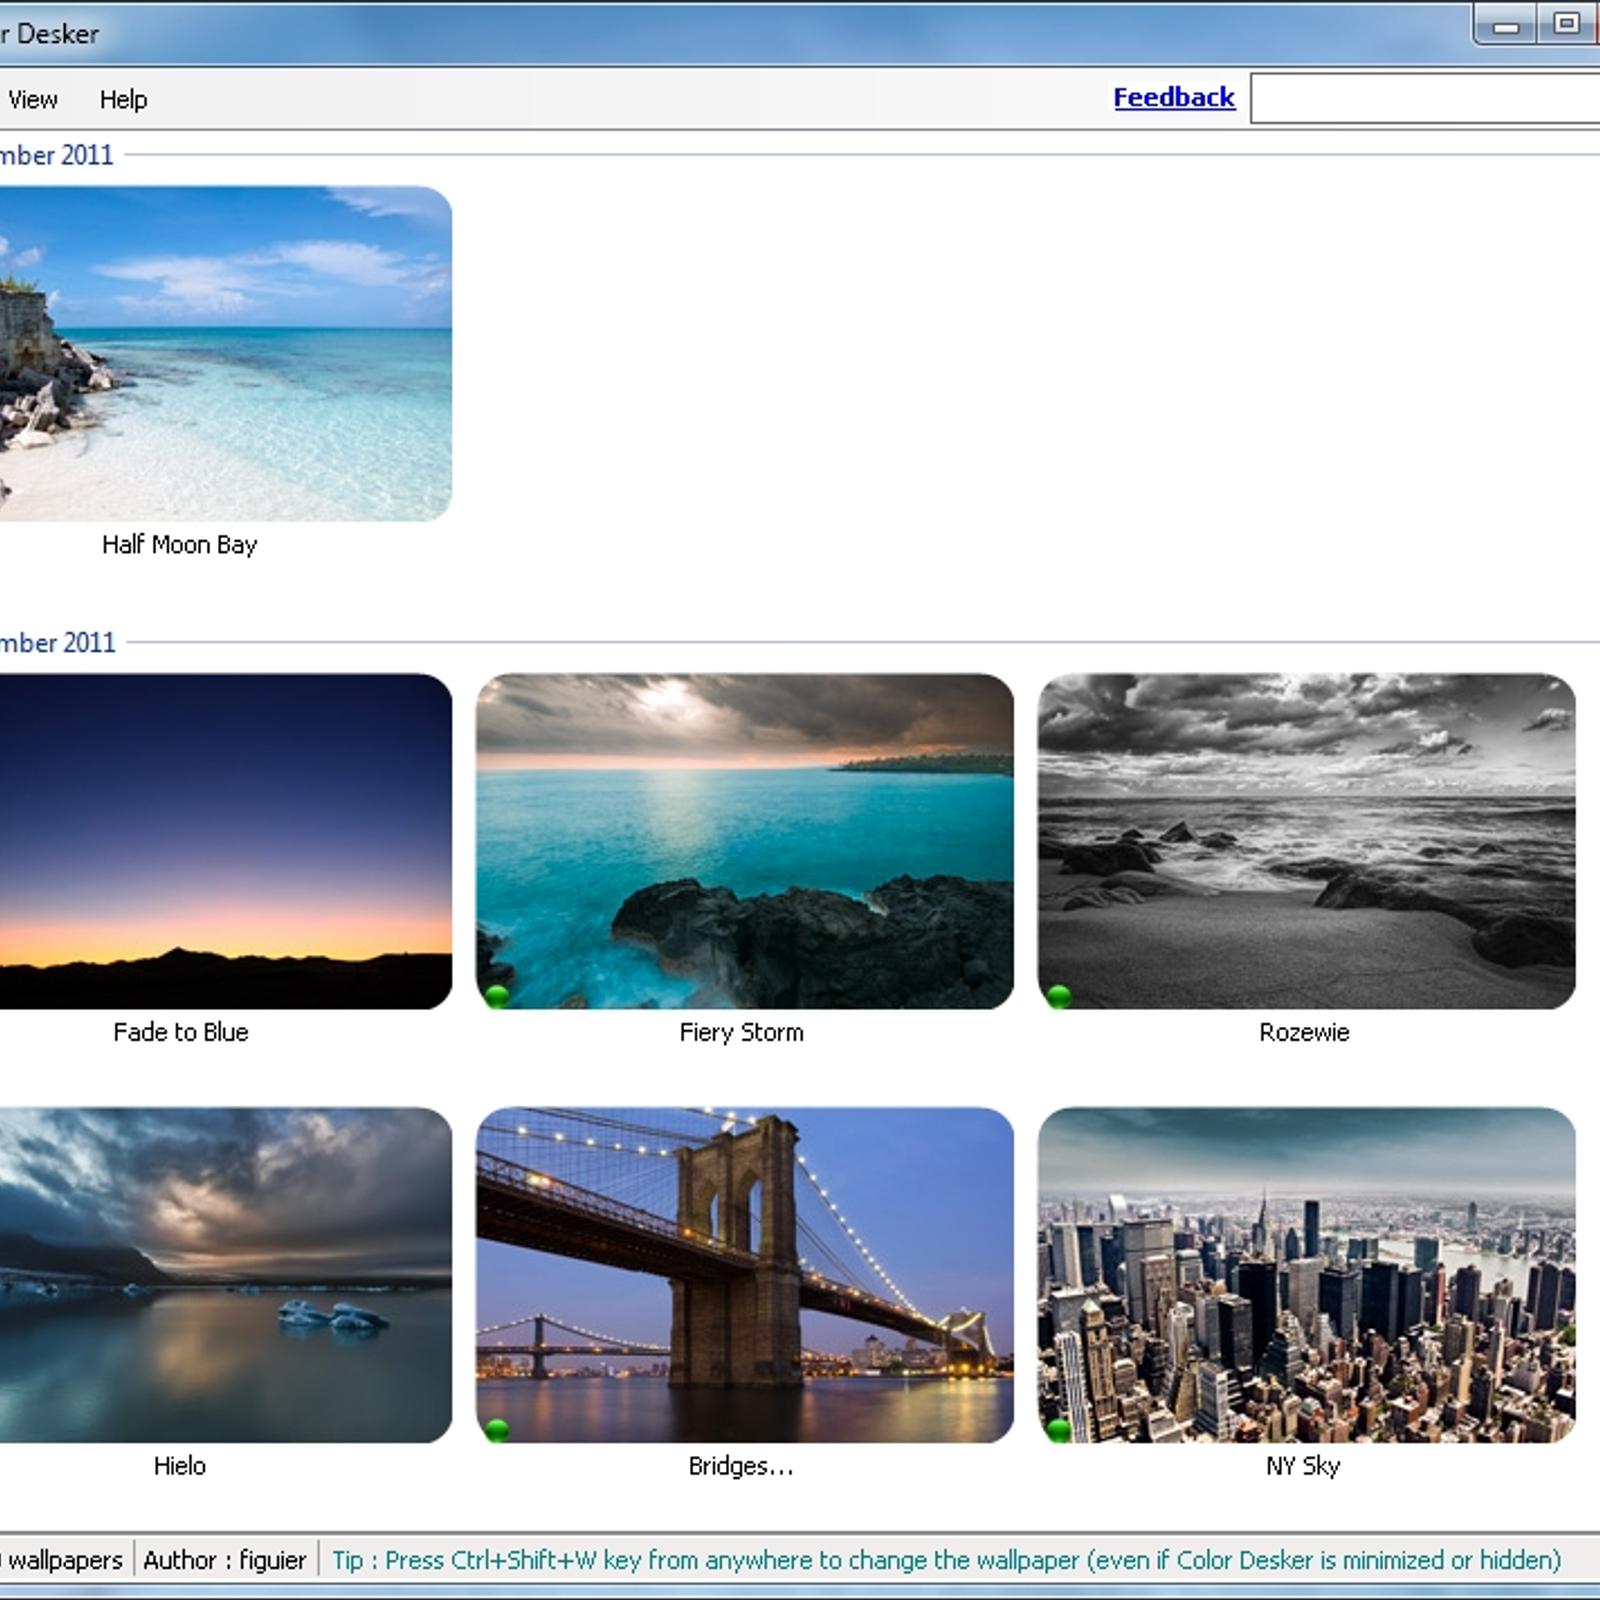 Pleasant Color Desker Alternatives And Similar Software Download Free Architecture Designs Scobabritishbridgeorg